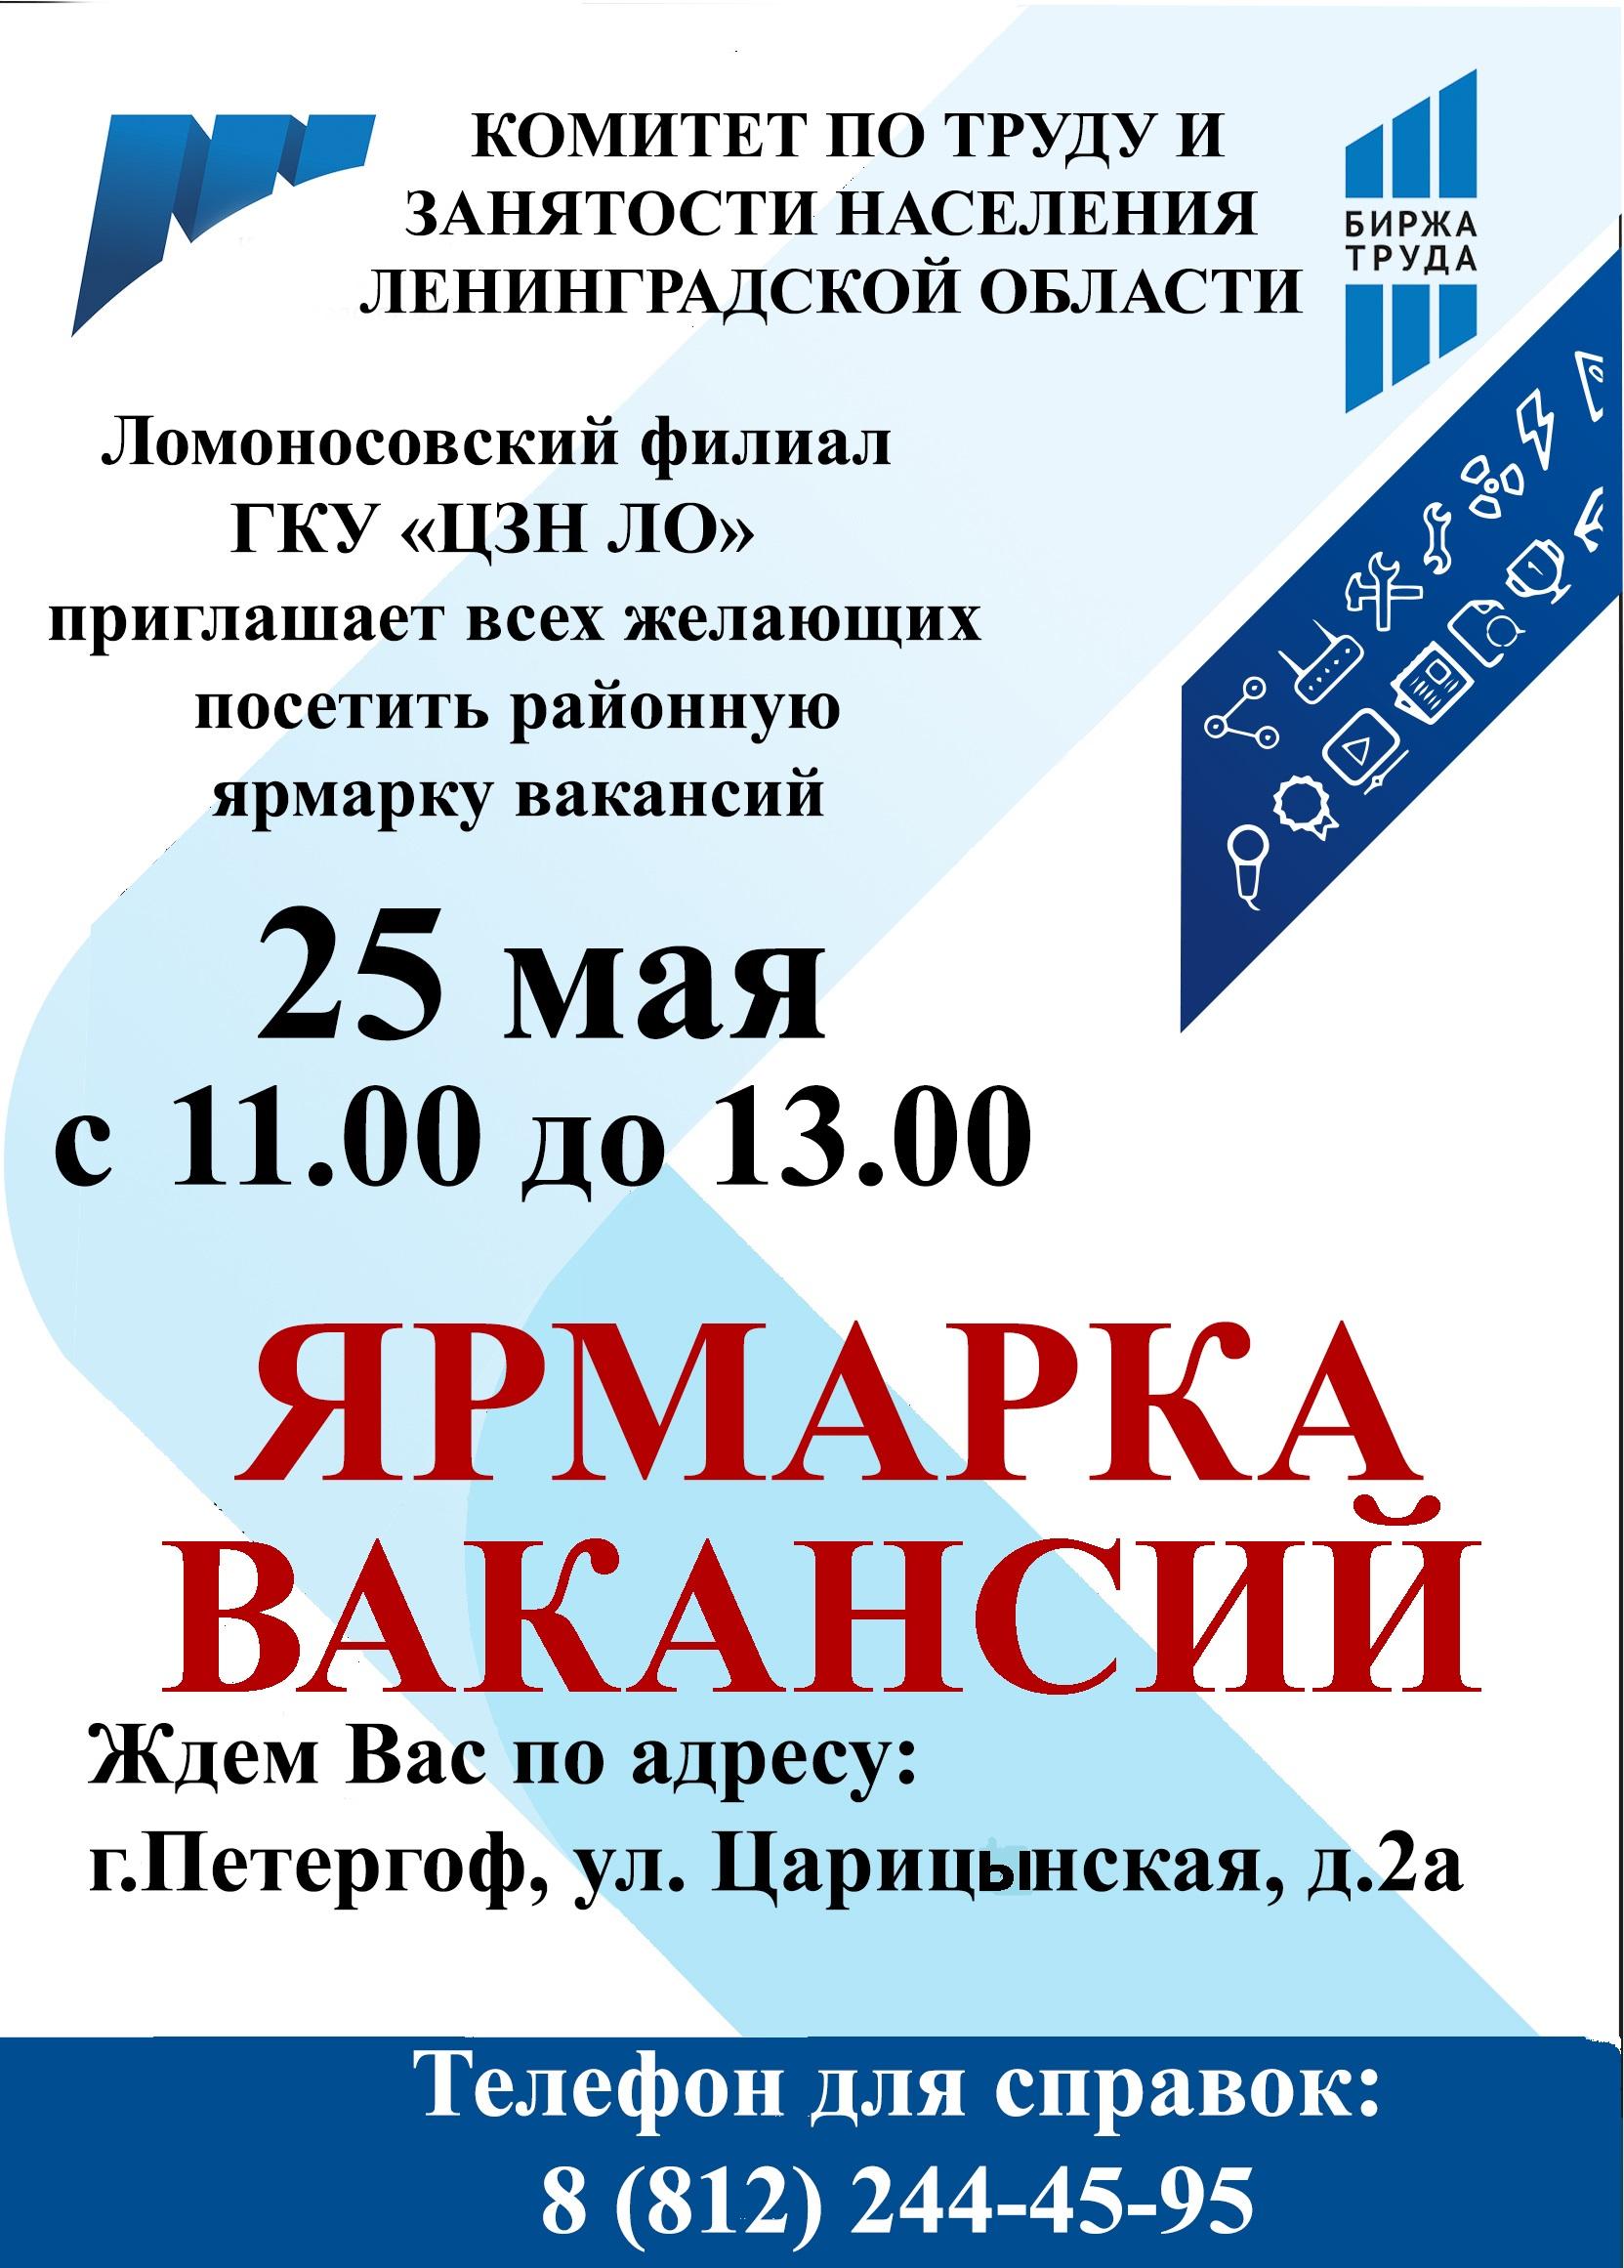 poster_vakansii prez 3 копия